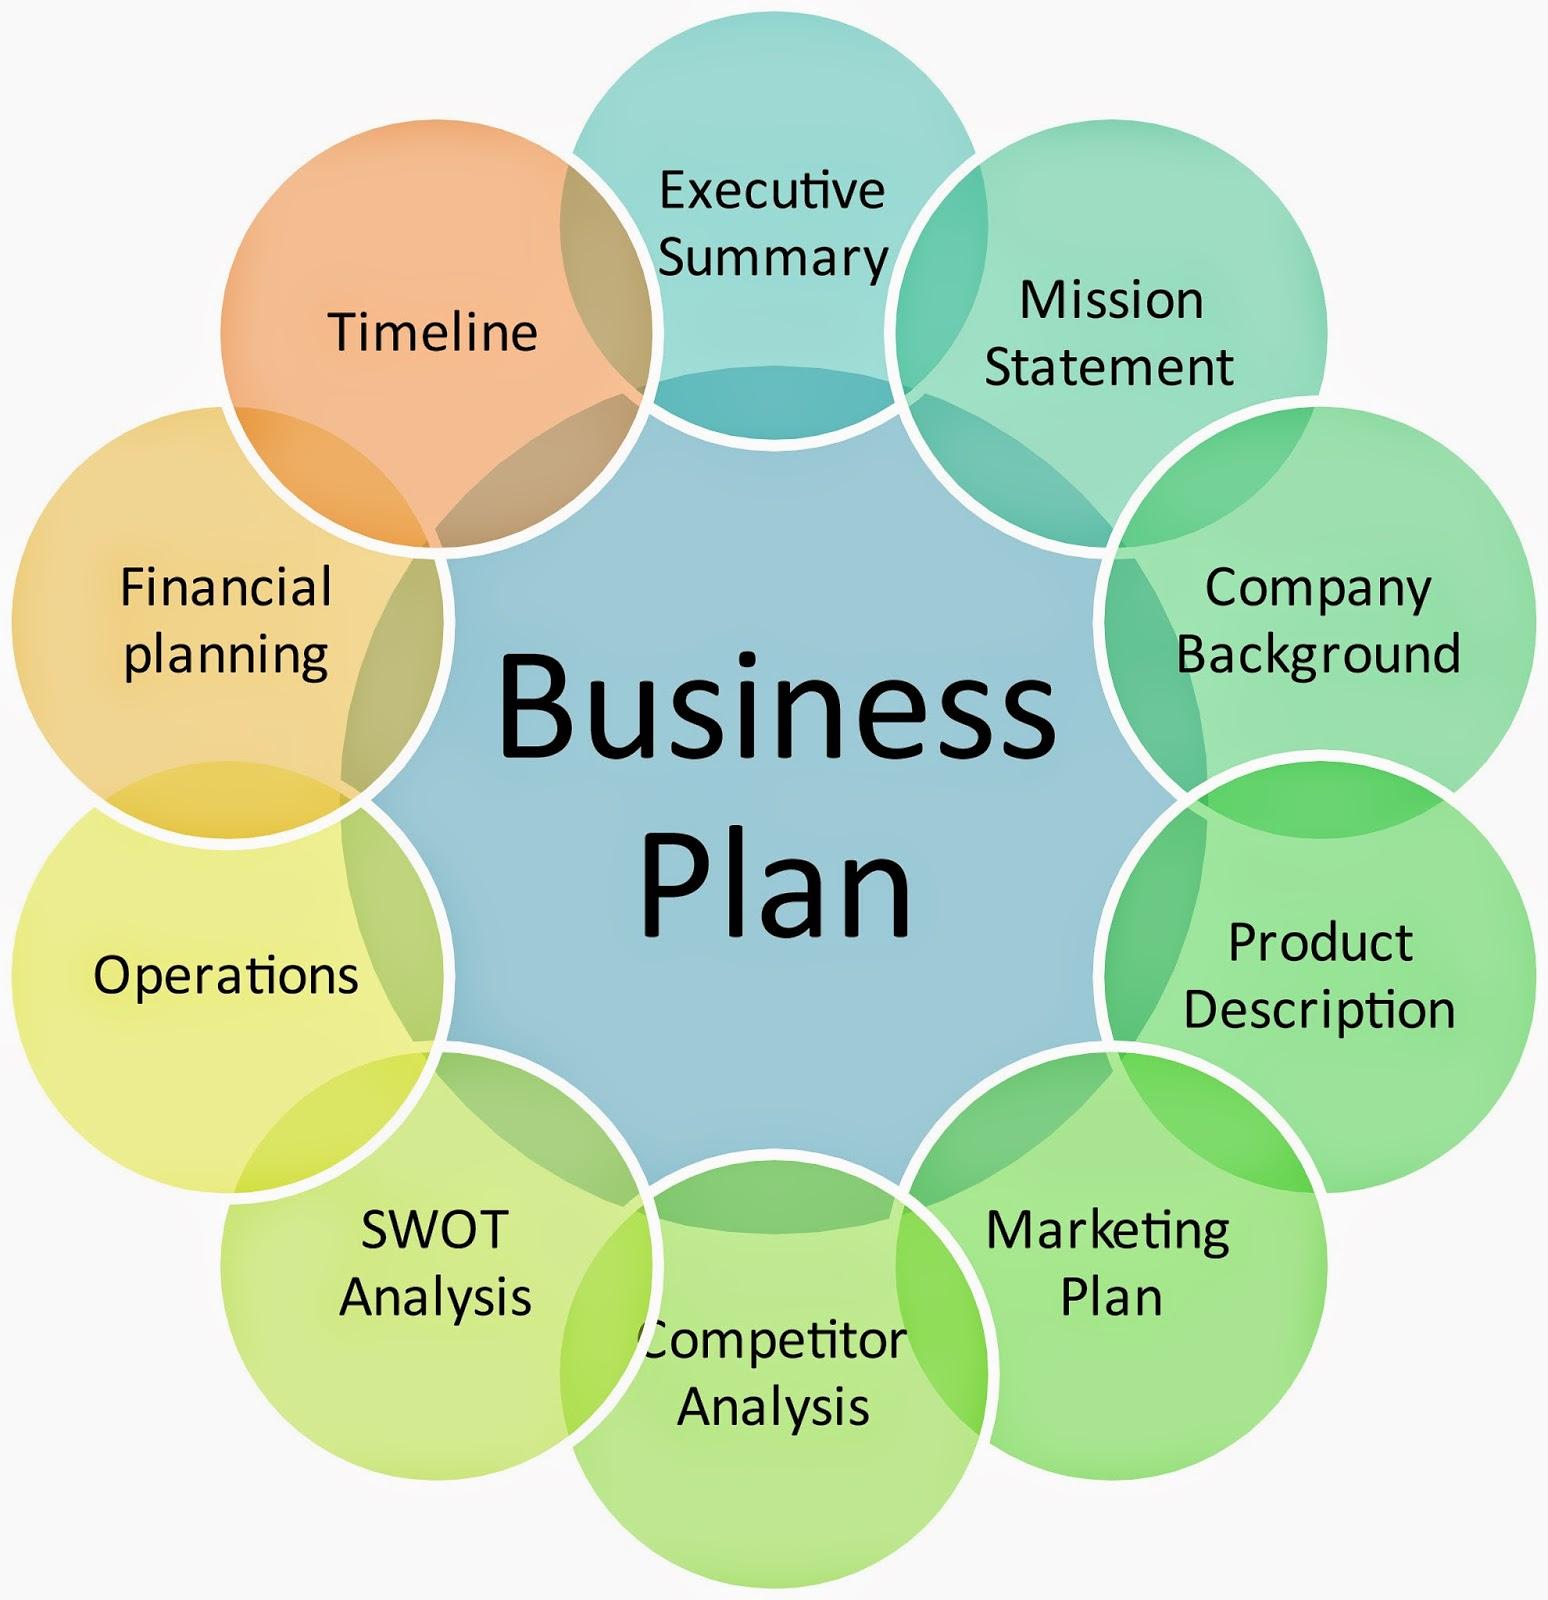 Bisnis strategi bisnis adalah strategi bisnis online strategi bisnis